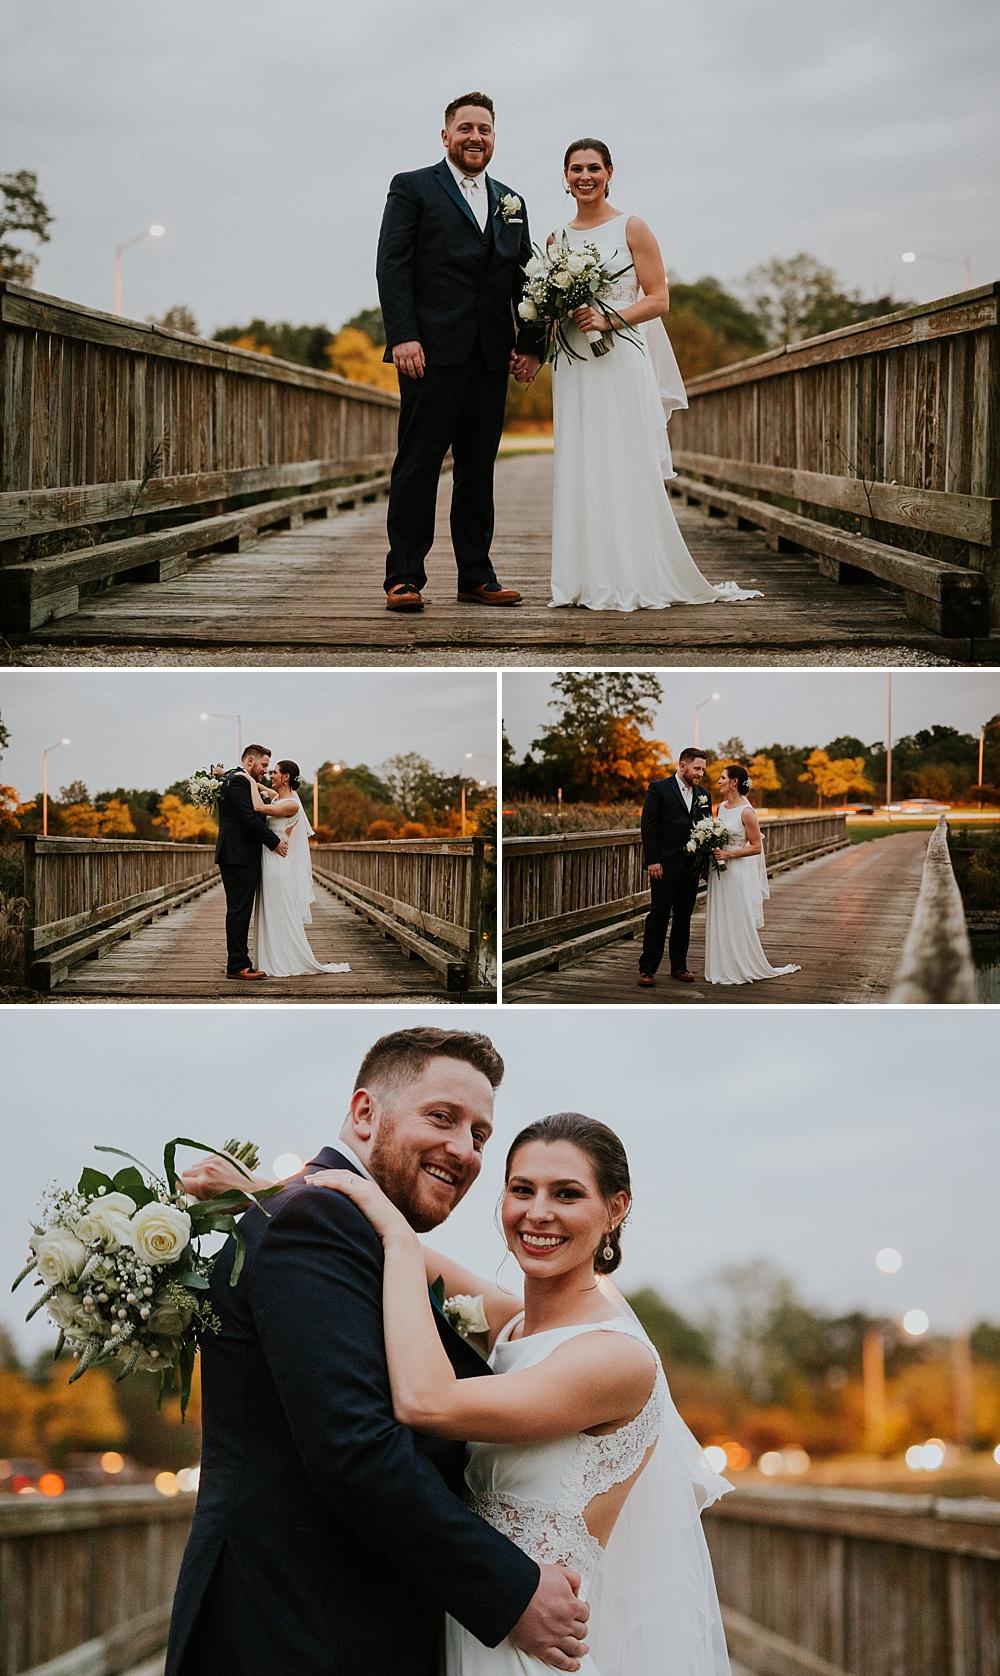 Mike-Stephanie_chicago_wedding_liller-photo-00076.jpg